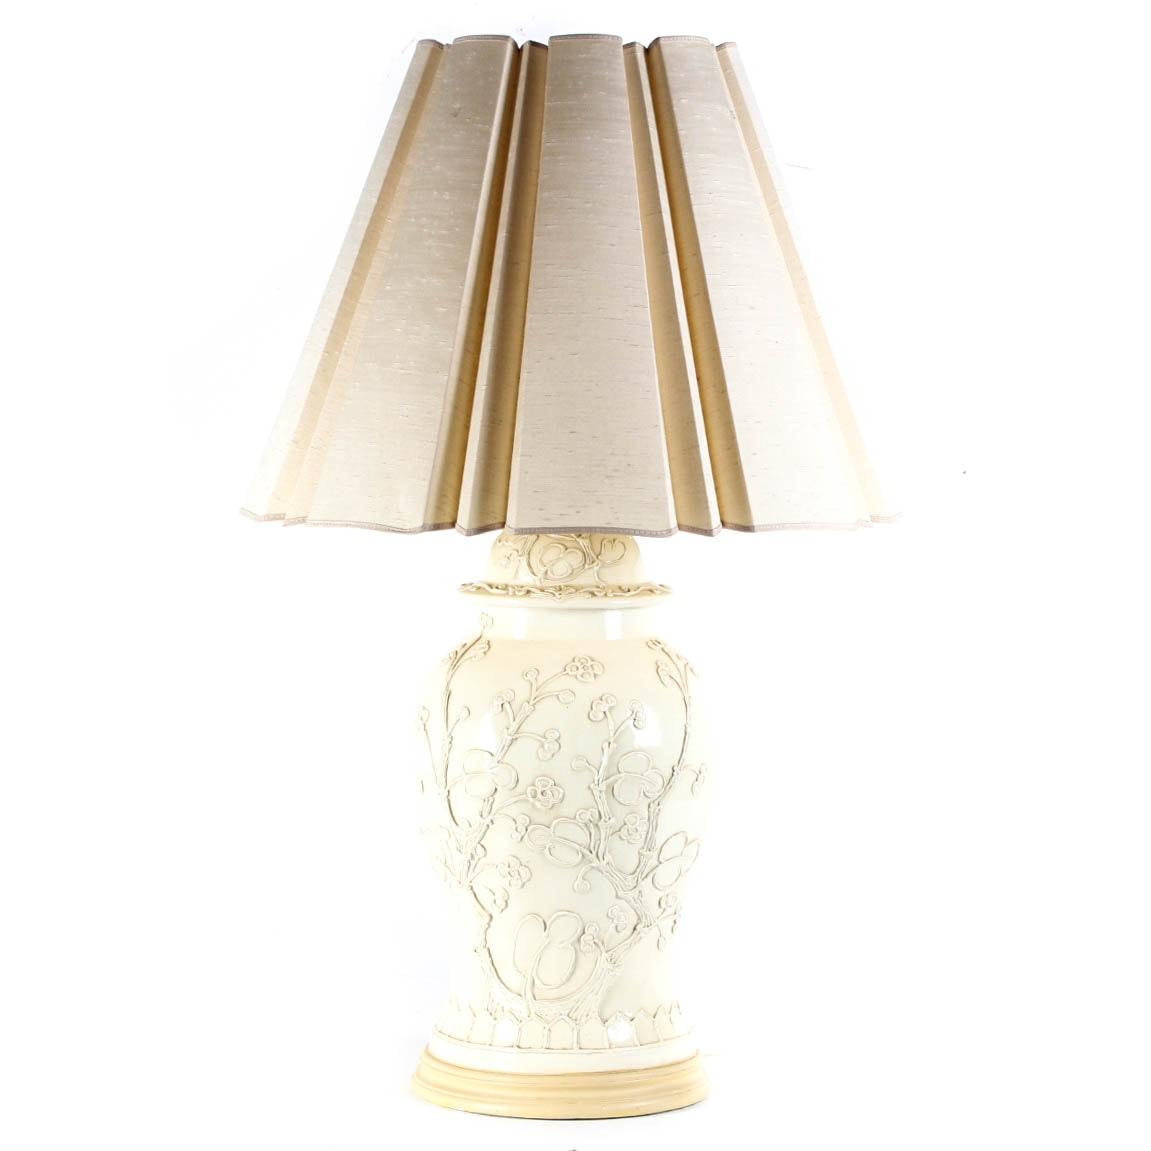 Cream Colored Chinoiserie Lamp